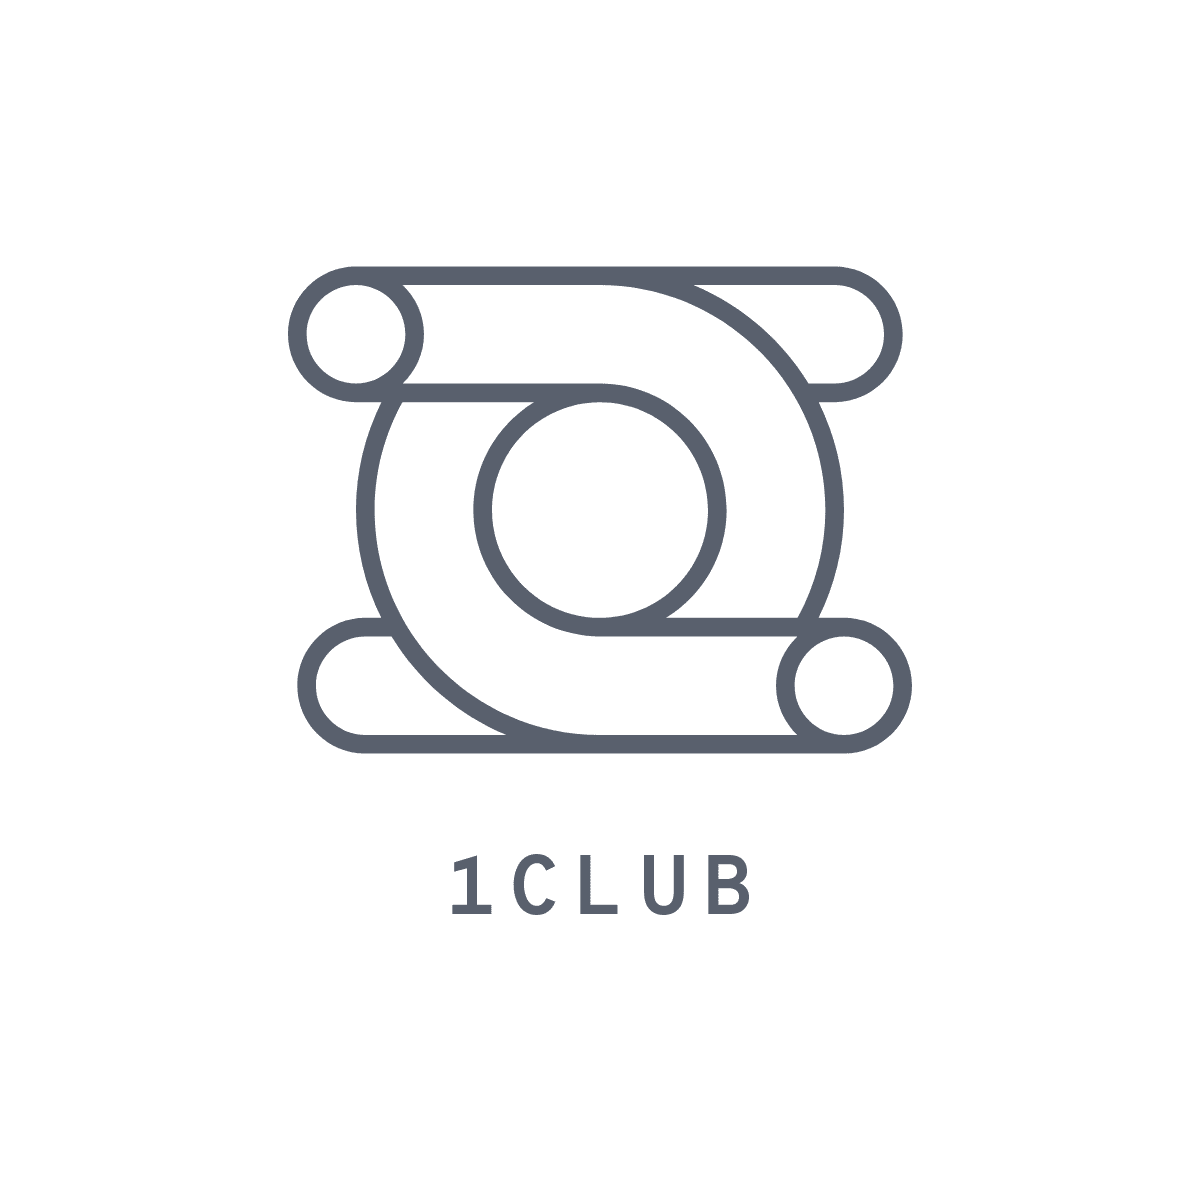 Логотип делового клуба фото f_1295f8712c614d0e.png